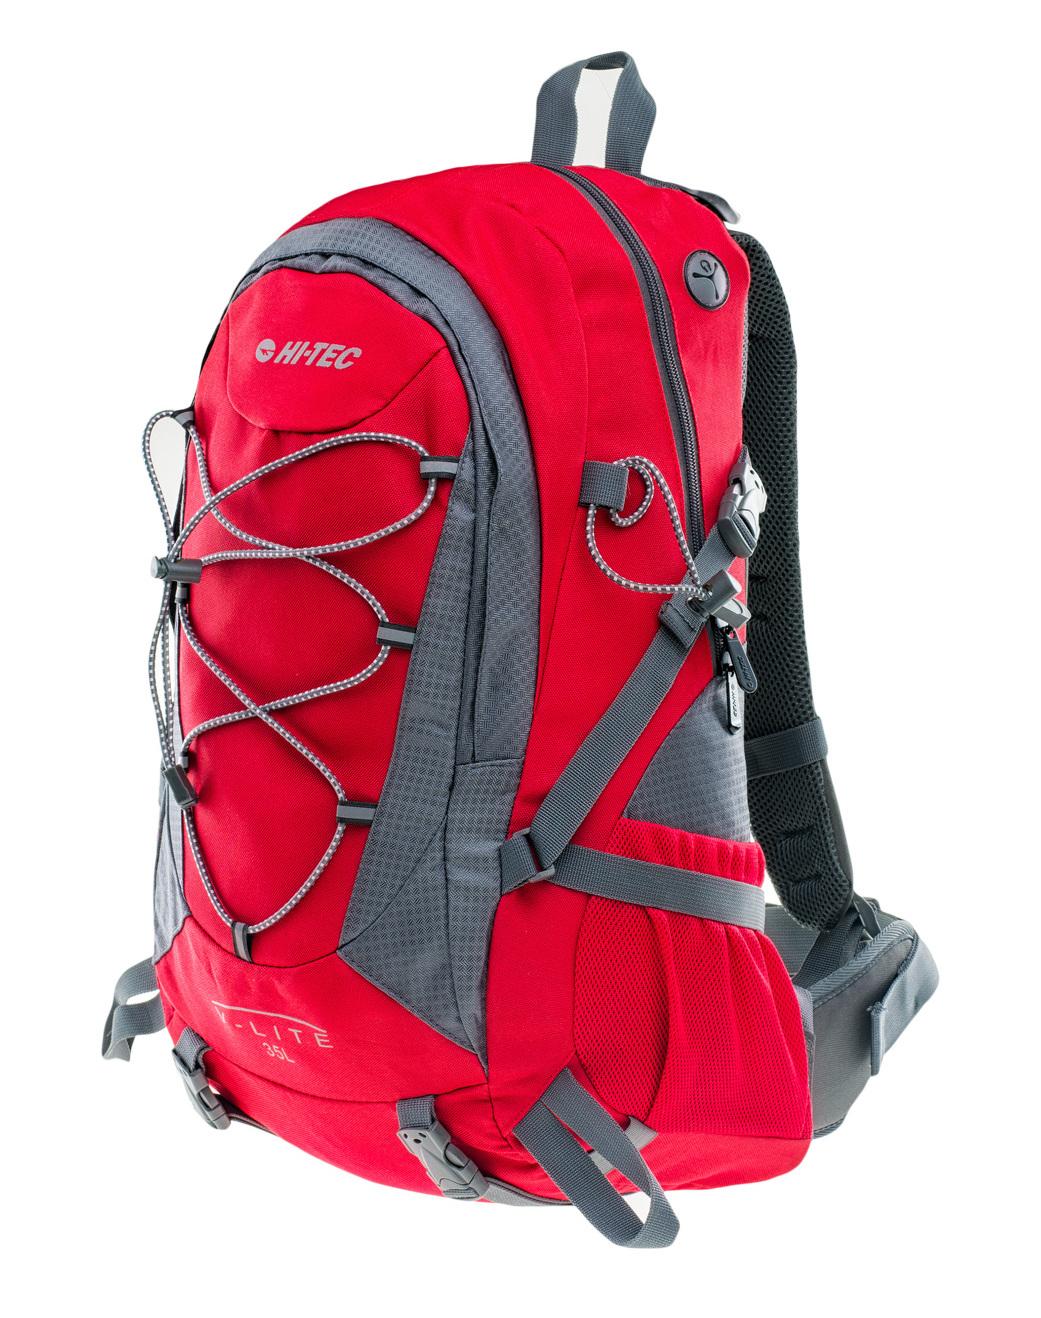 e8eb3c60bc620 HI-TEC PLECAK górski trekkingowy Aruba 35 (Asila2) - 6936745597 ...